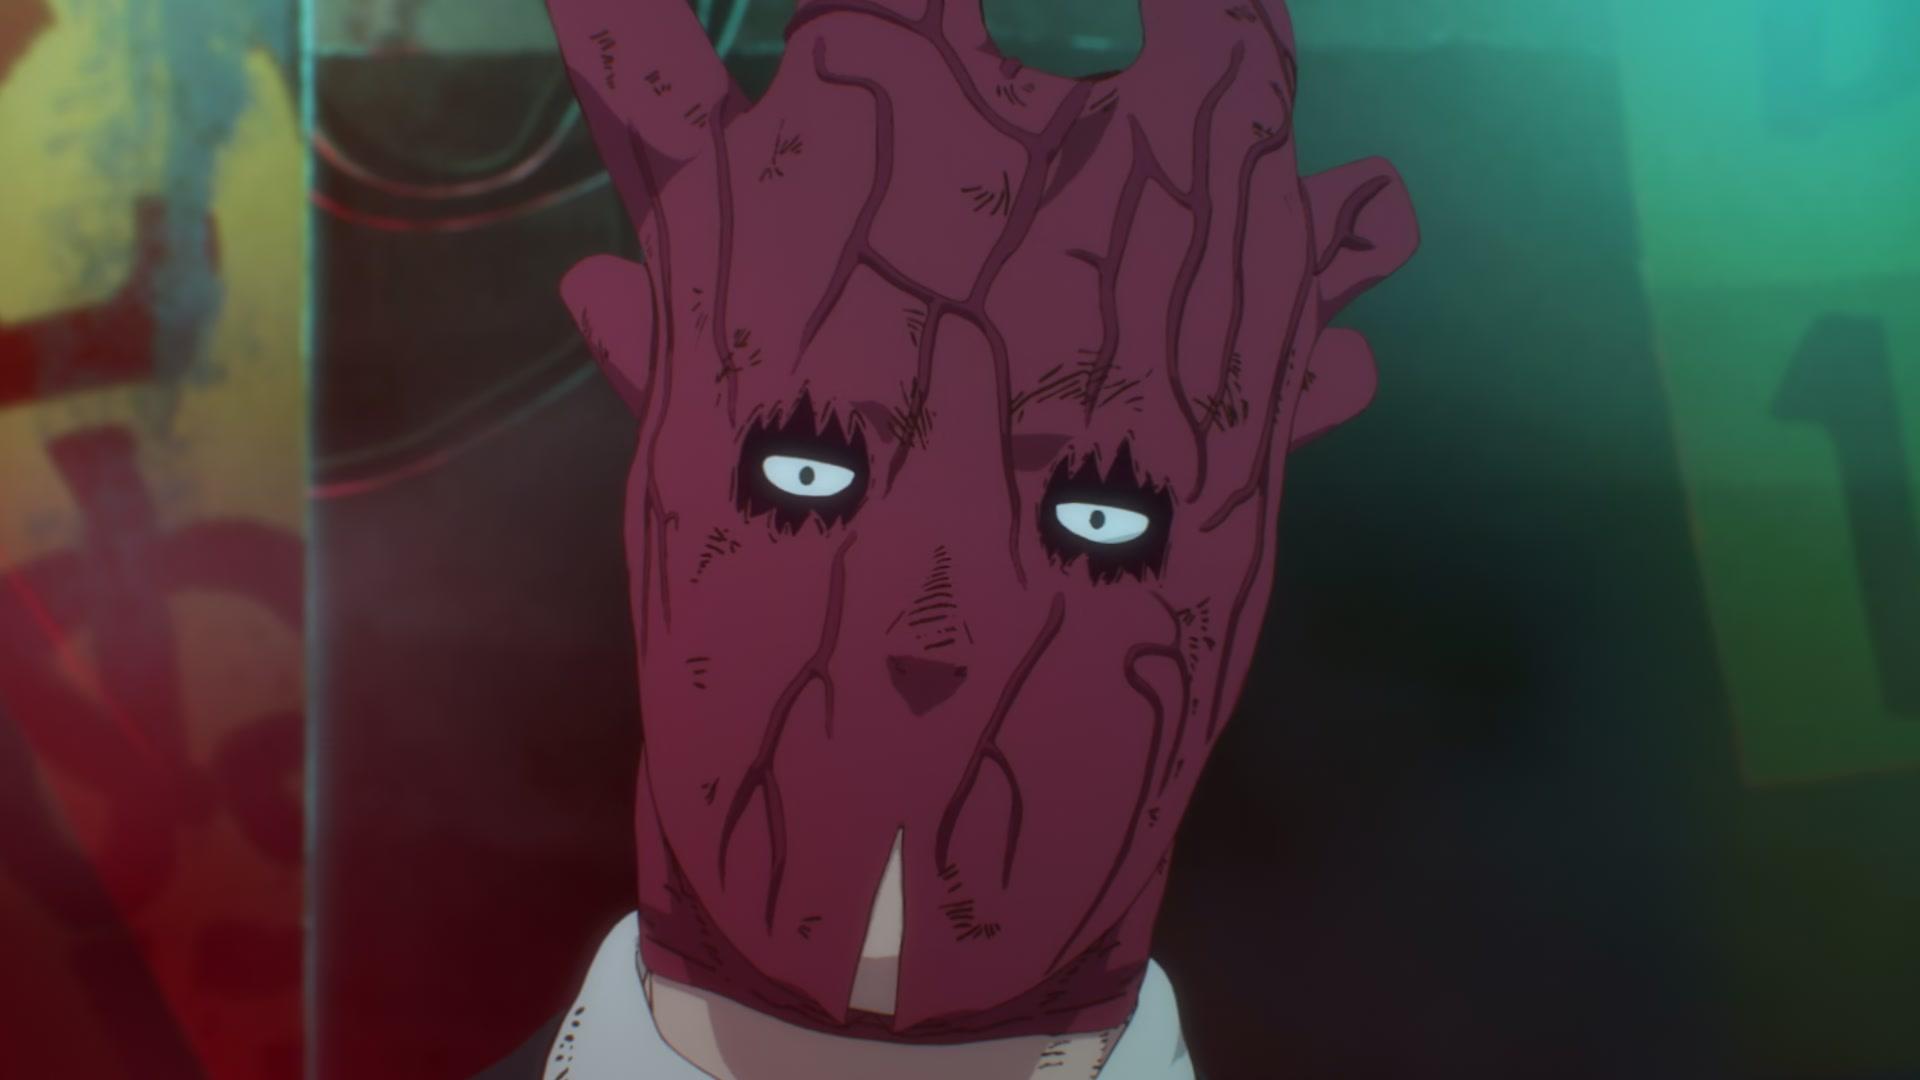 Dorohedoro-anime-episode-3-image-0267 (1).jpg